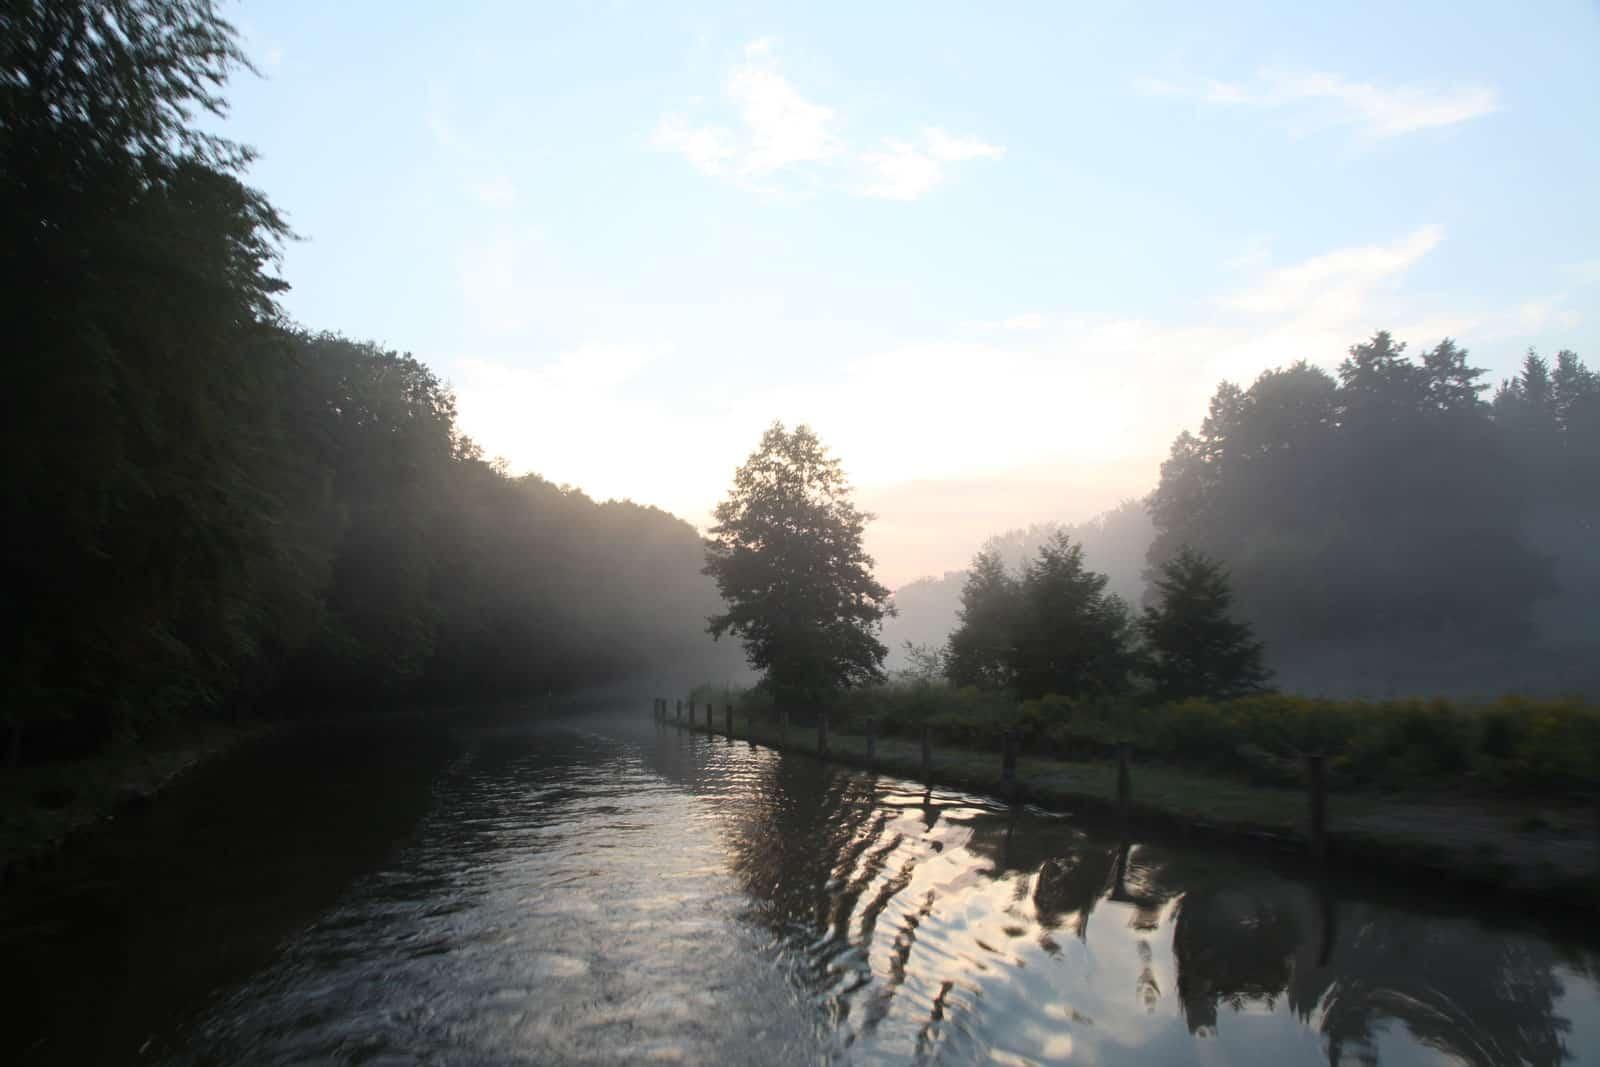 Nebel über Kanal